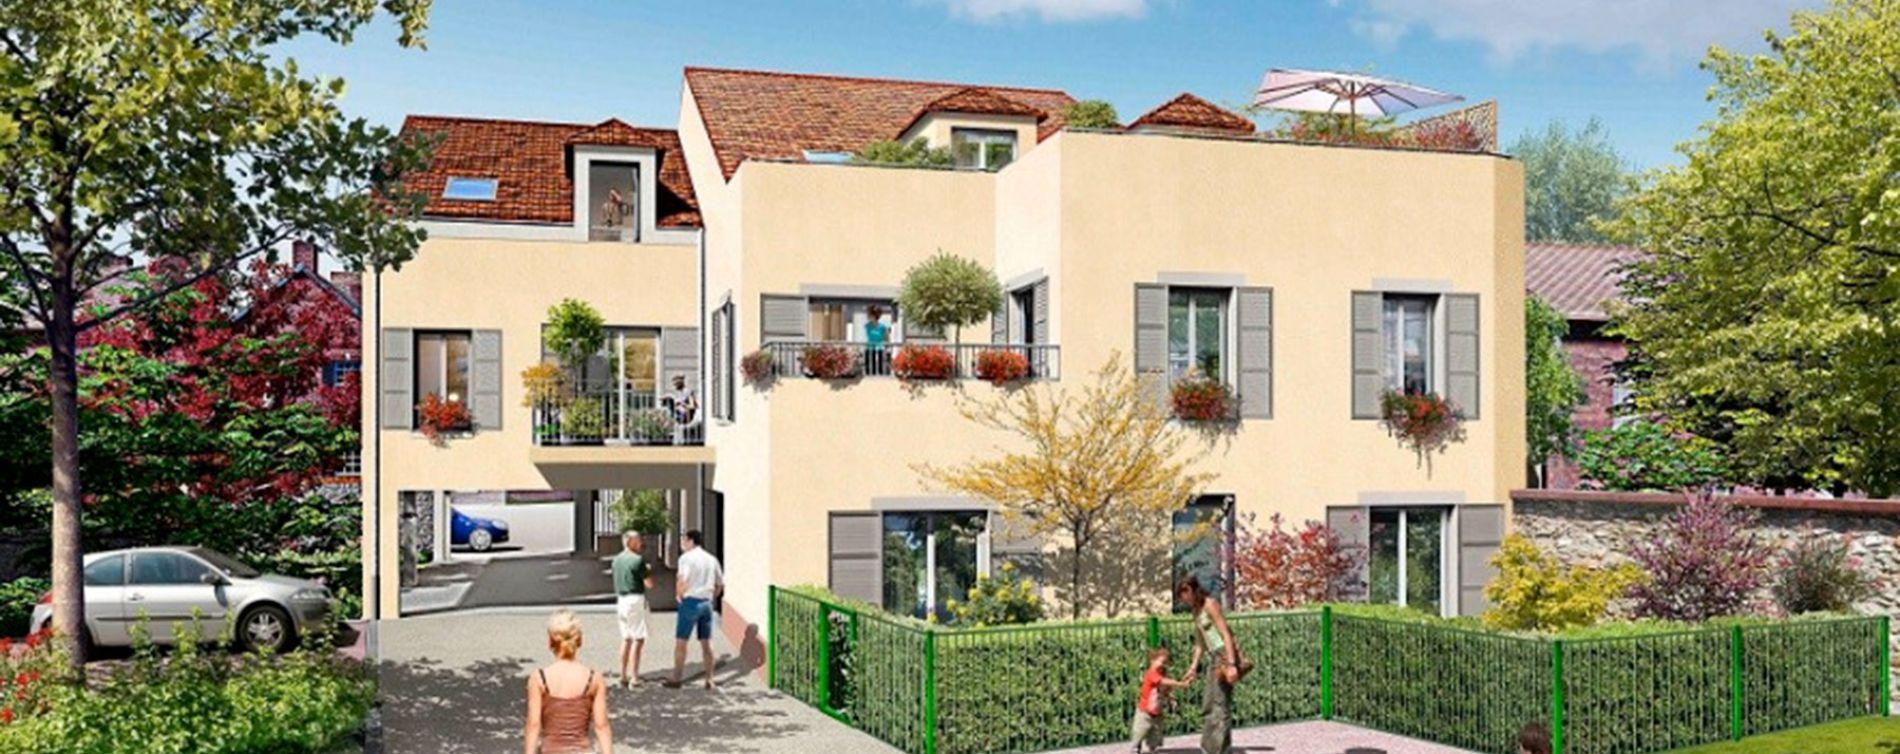 la villa beauregard chilly mazarin programme immobilier neuf n 214640. Black Bedroom Furniture Sets. Home Design Ideas